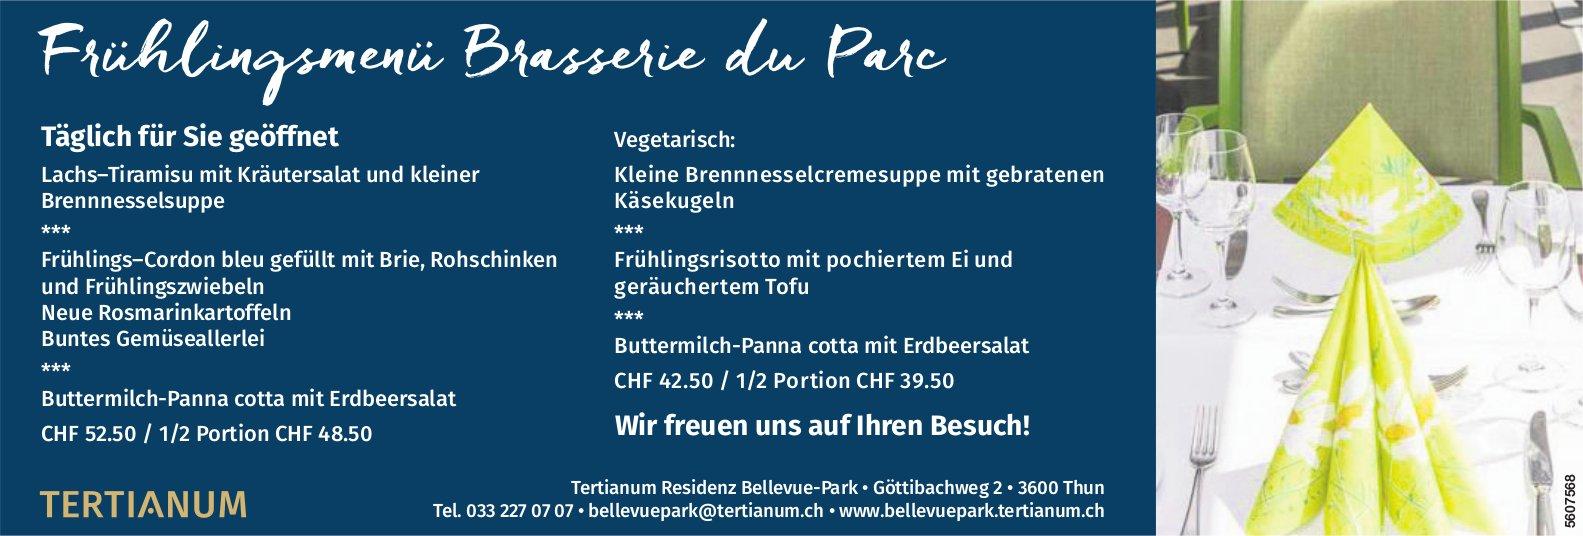 Tertianum Residenz Bellevue-Park - Frühlingsmenü Brasserie du Parc